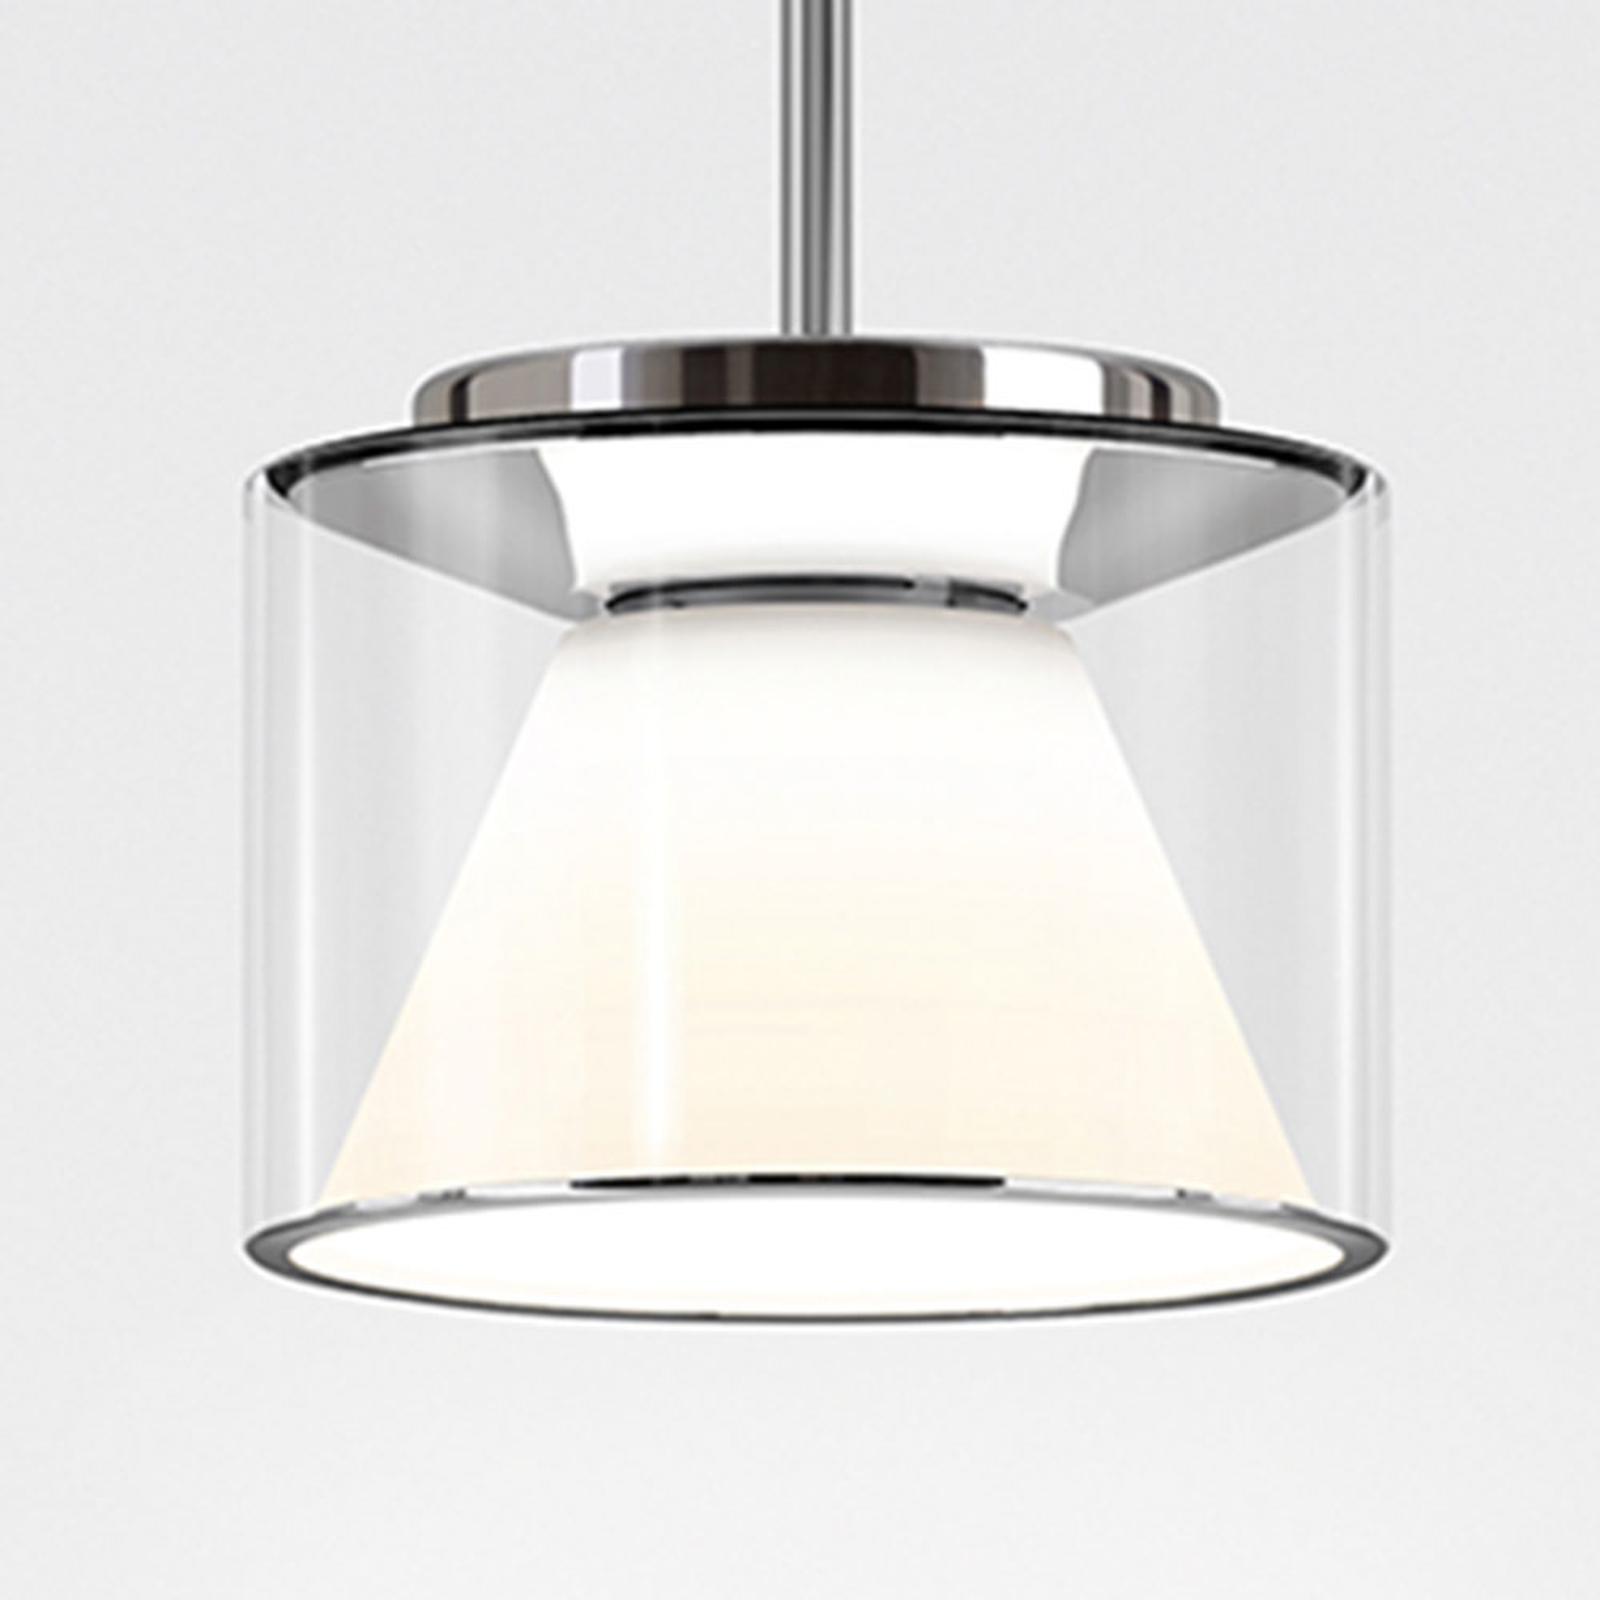 serien.lighting Drum S Pendel Rohr 927 Triac flach